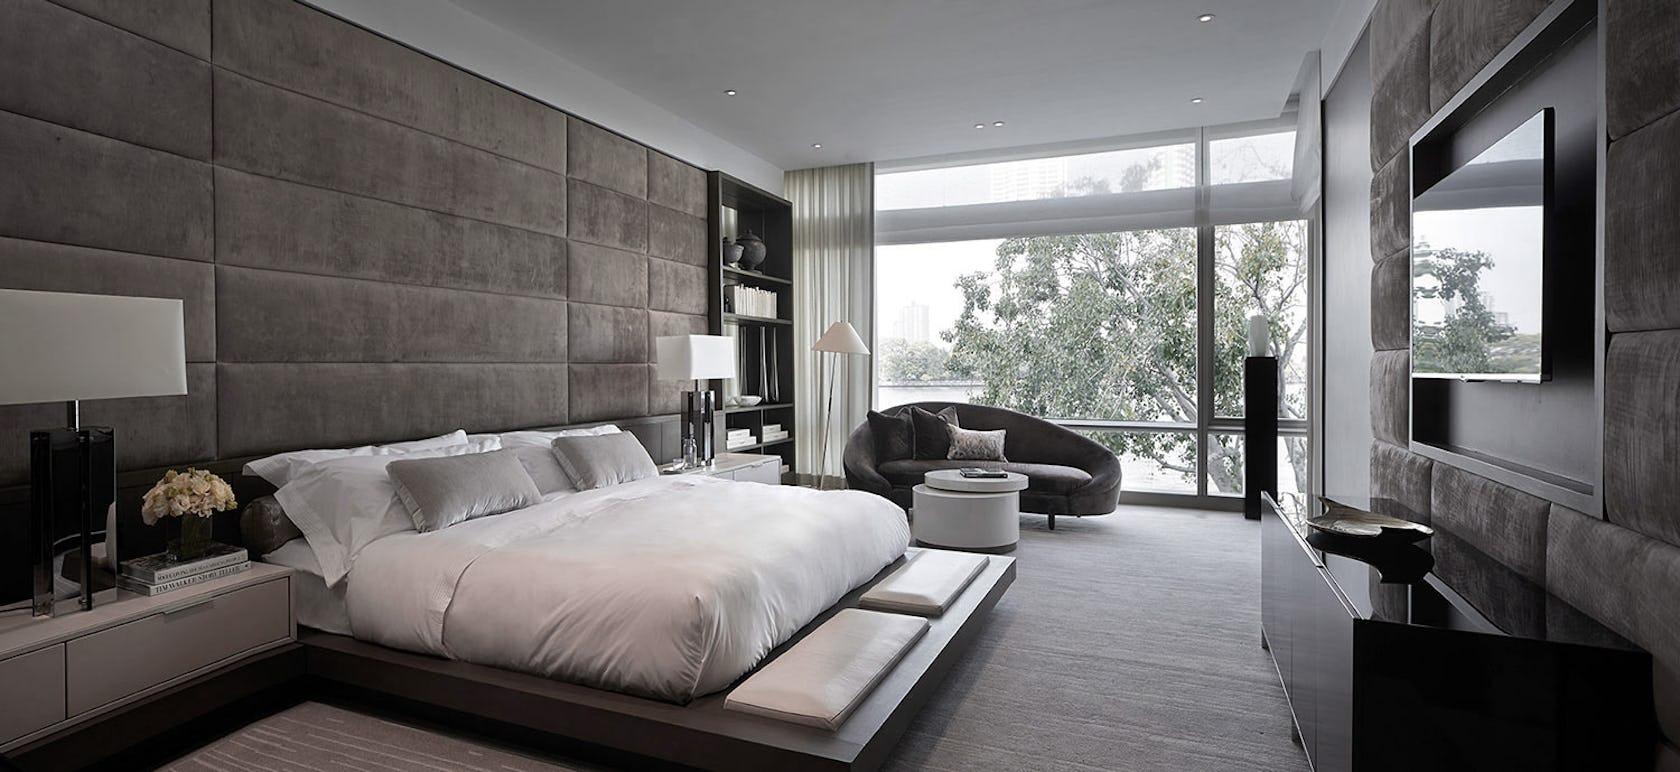 interior design indoors bedroom room furniture bed